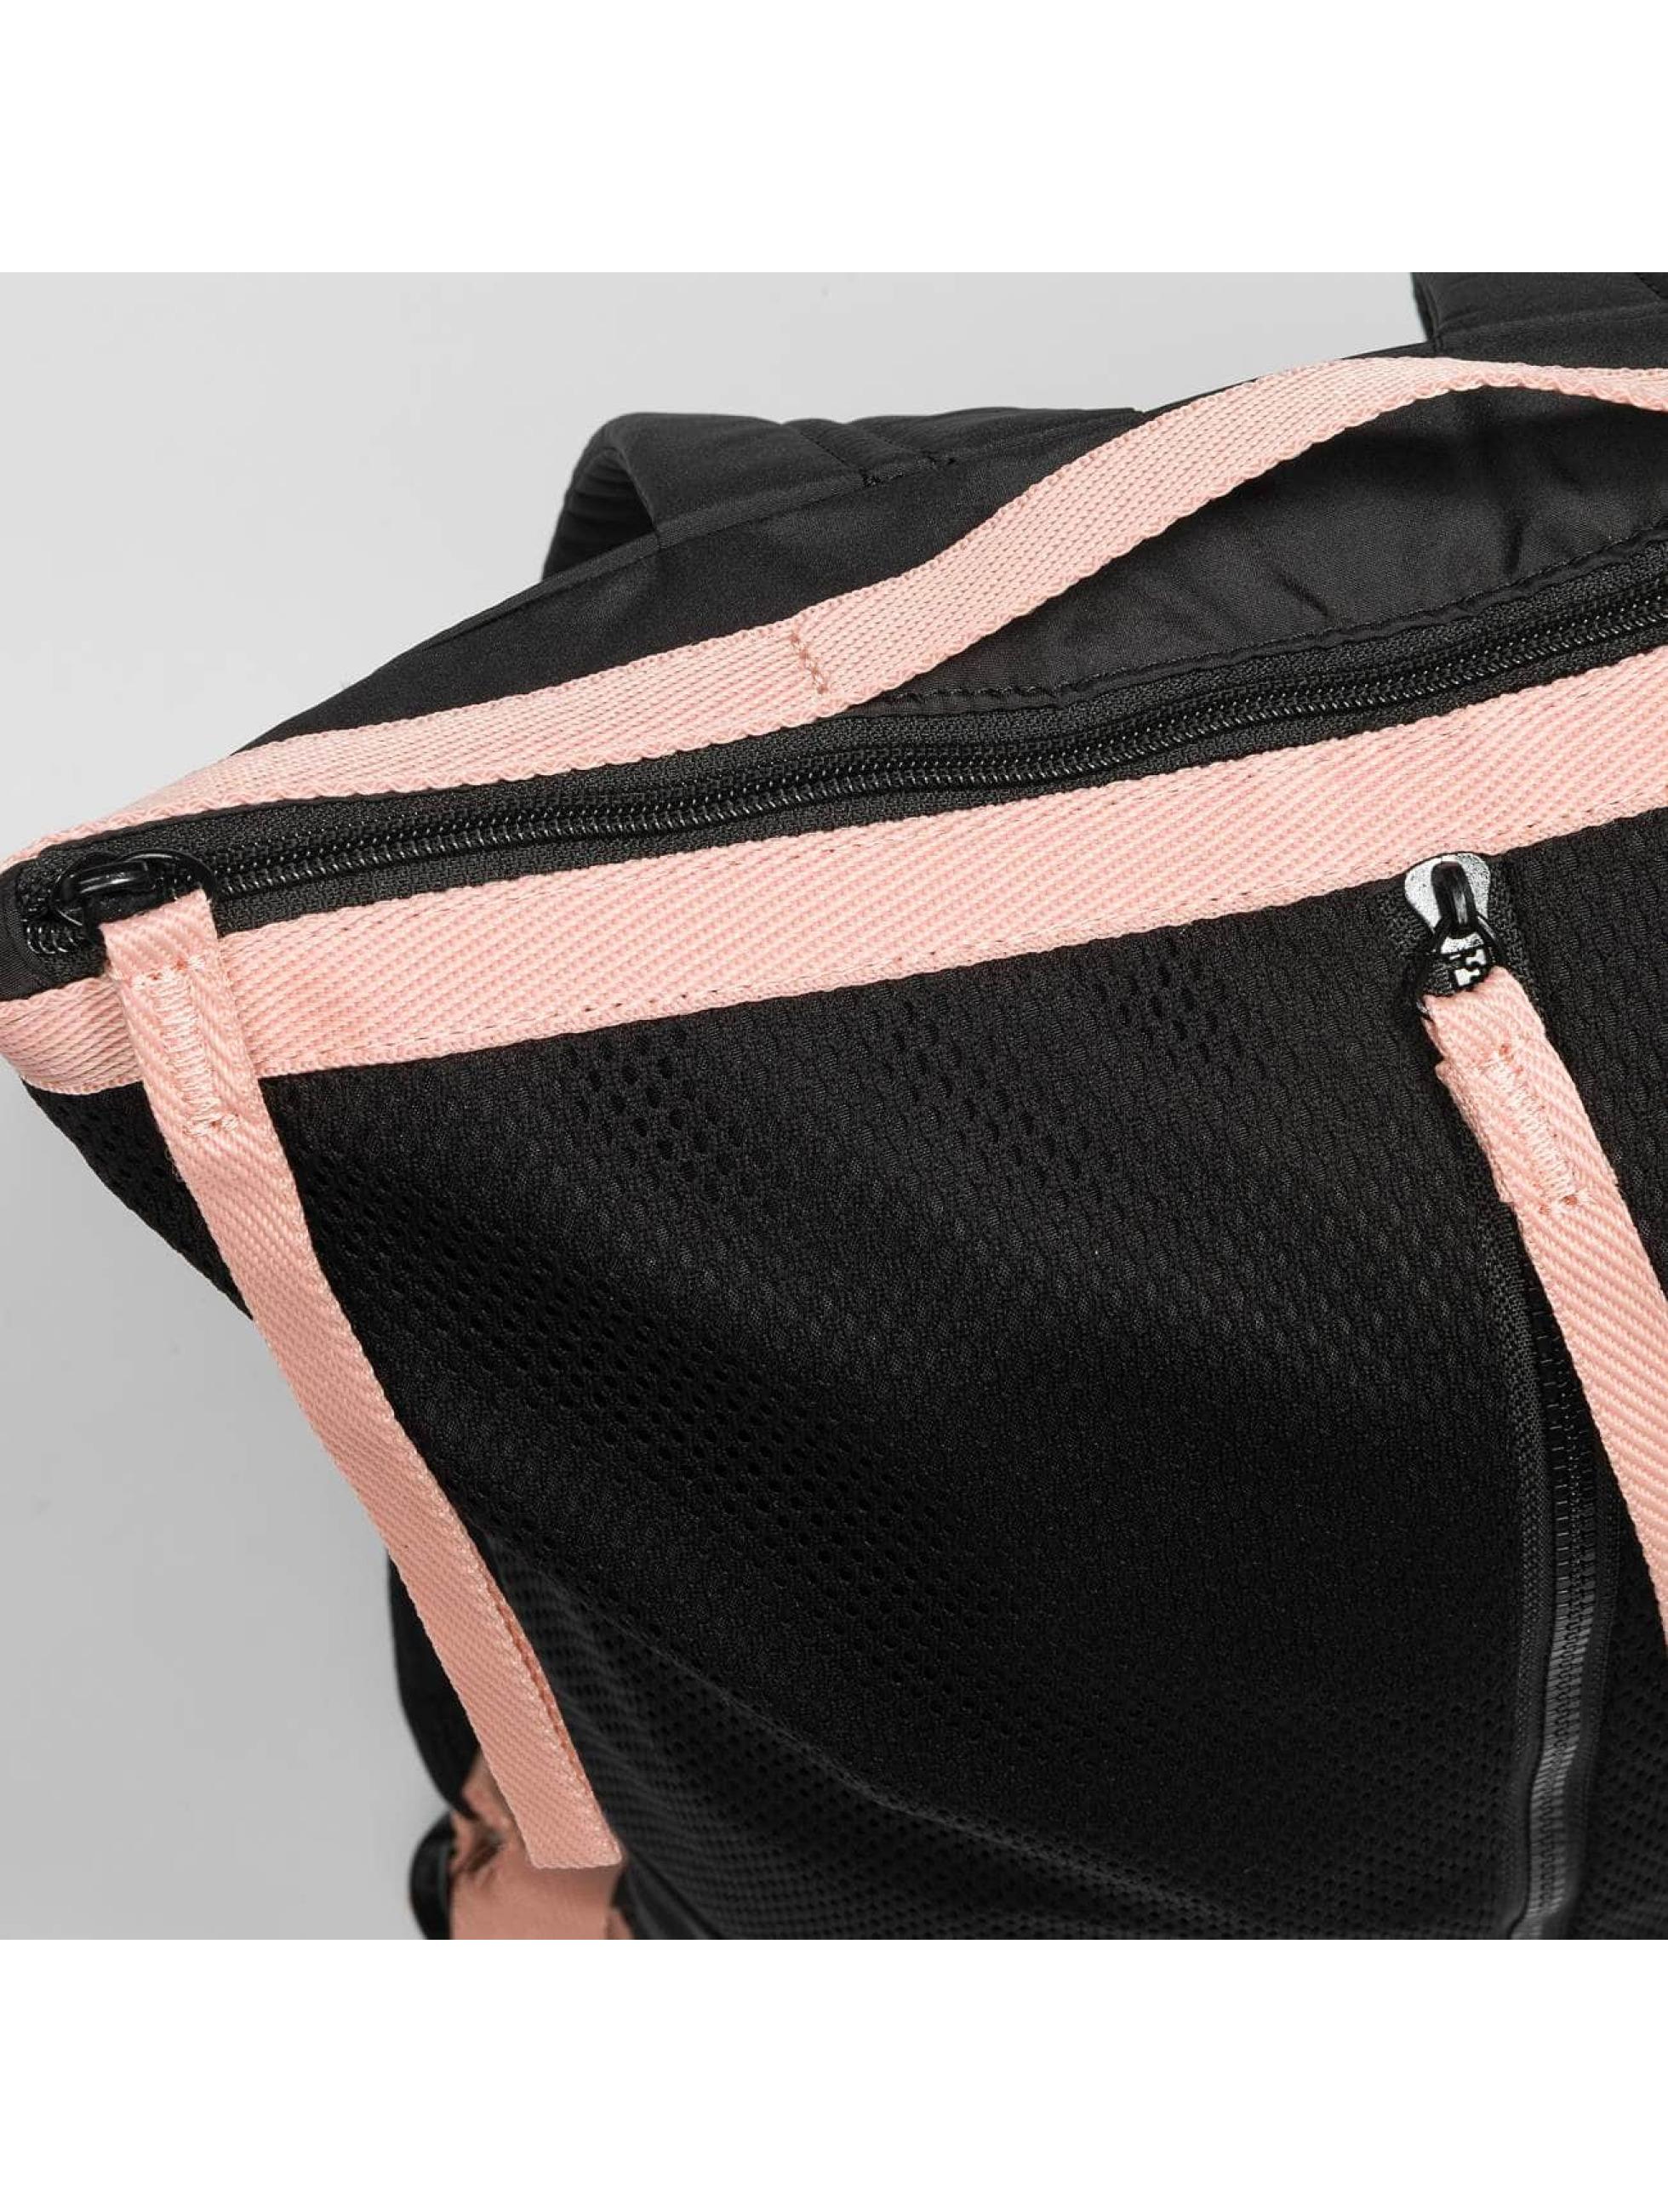 Puma Rucksack Prime Zip schwarz